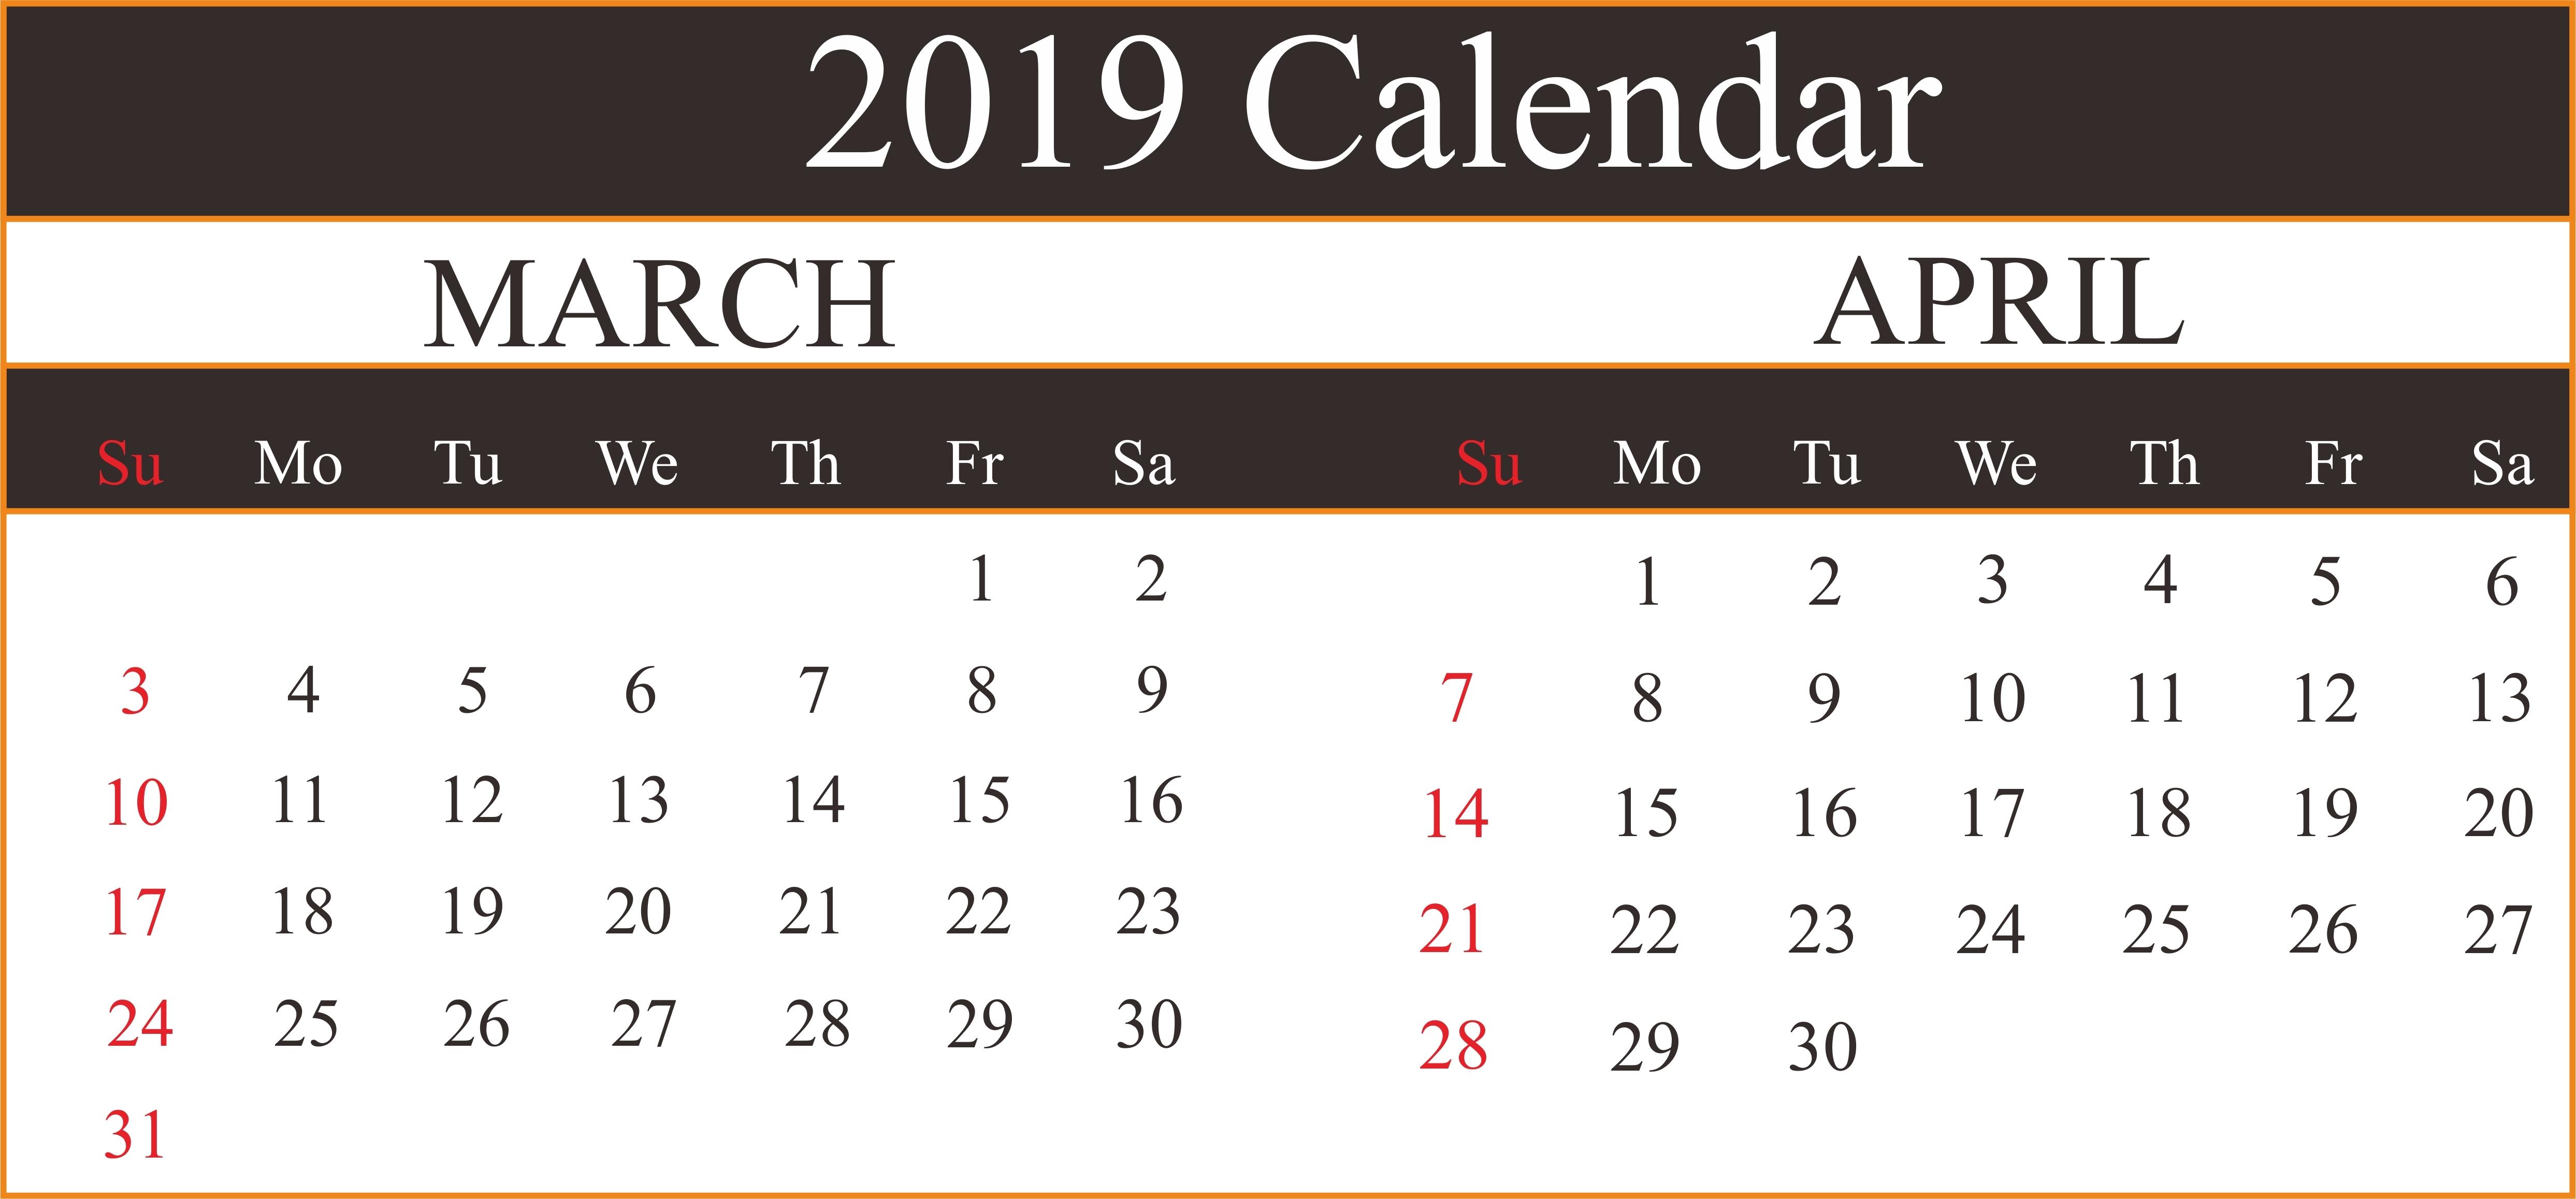 March 7 2019 Calendar | Calendar Format Example March 7 2019 Calendar